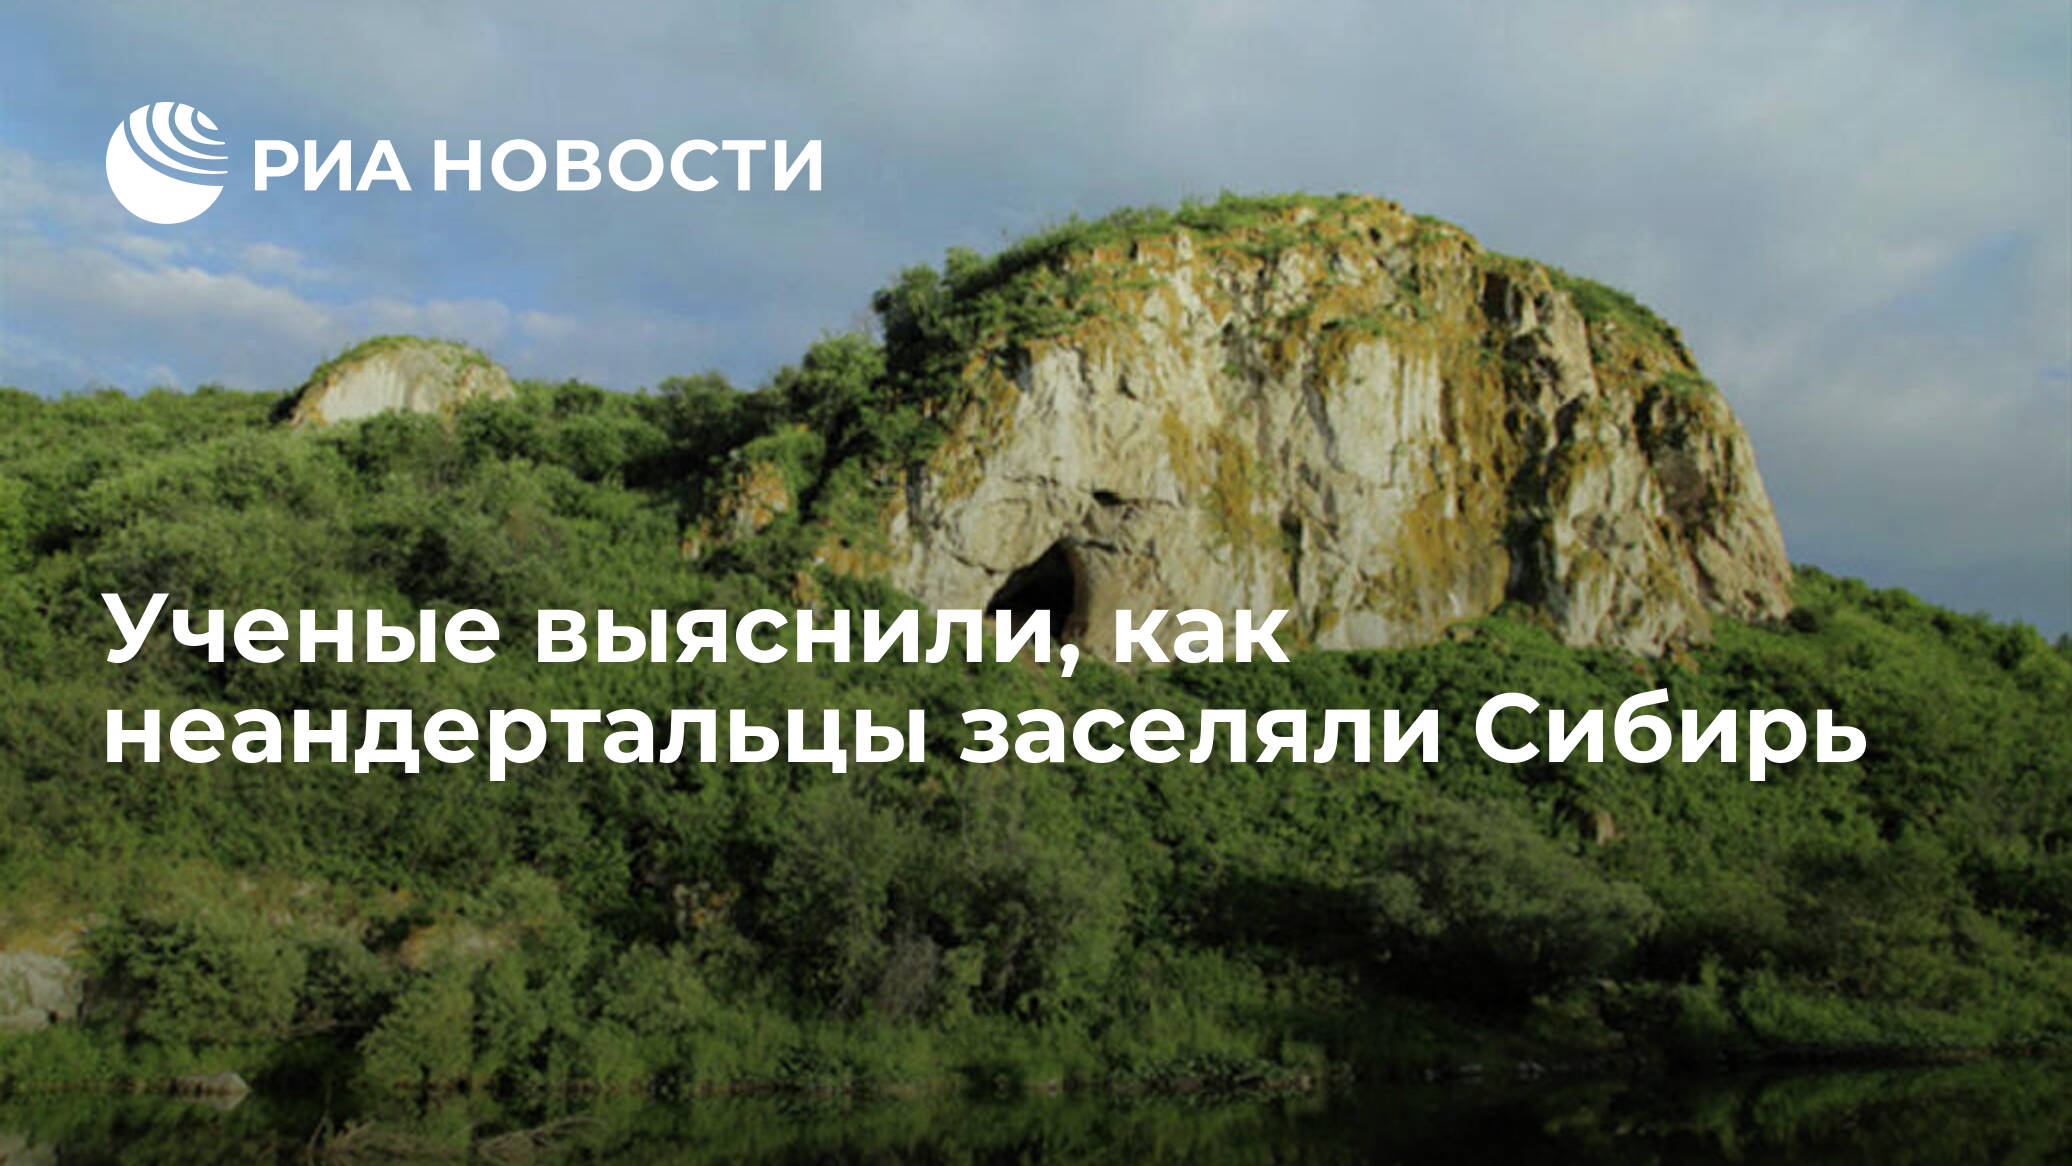 https://cdn24.img.ria.ru/images/sharing/article/1563939979.jpg?15639354701580202648